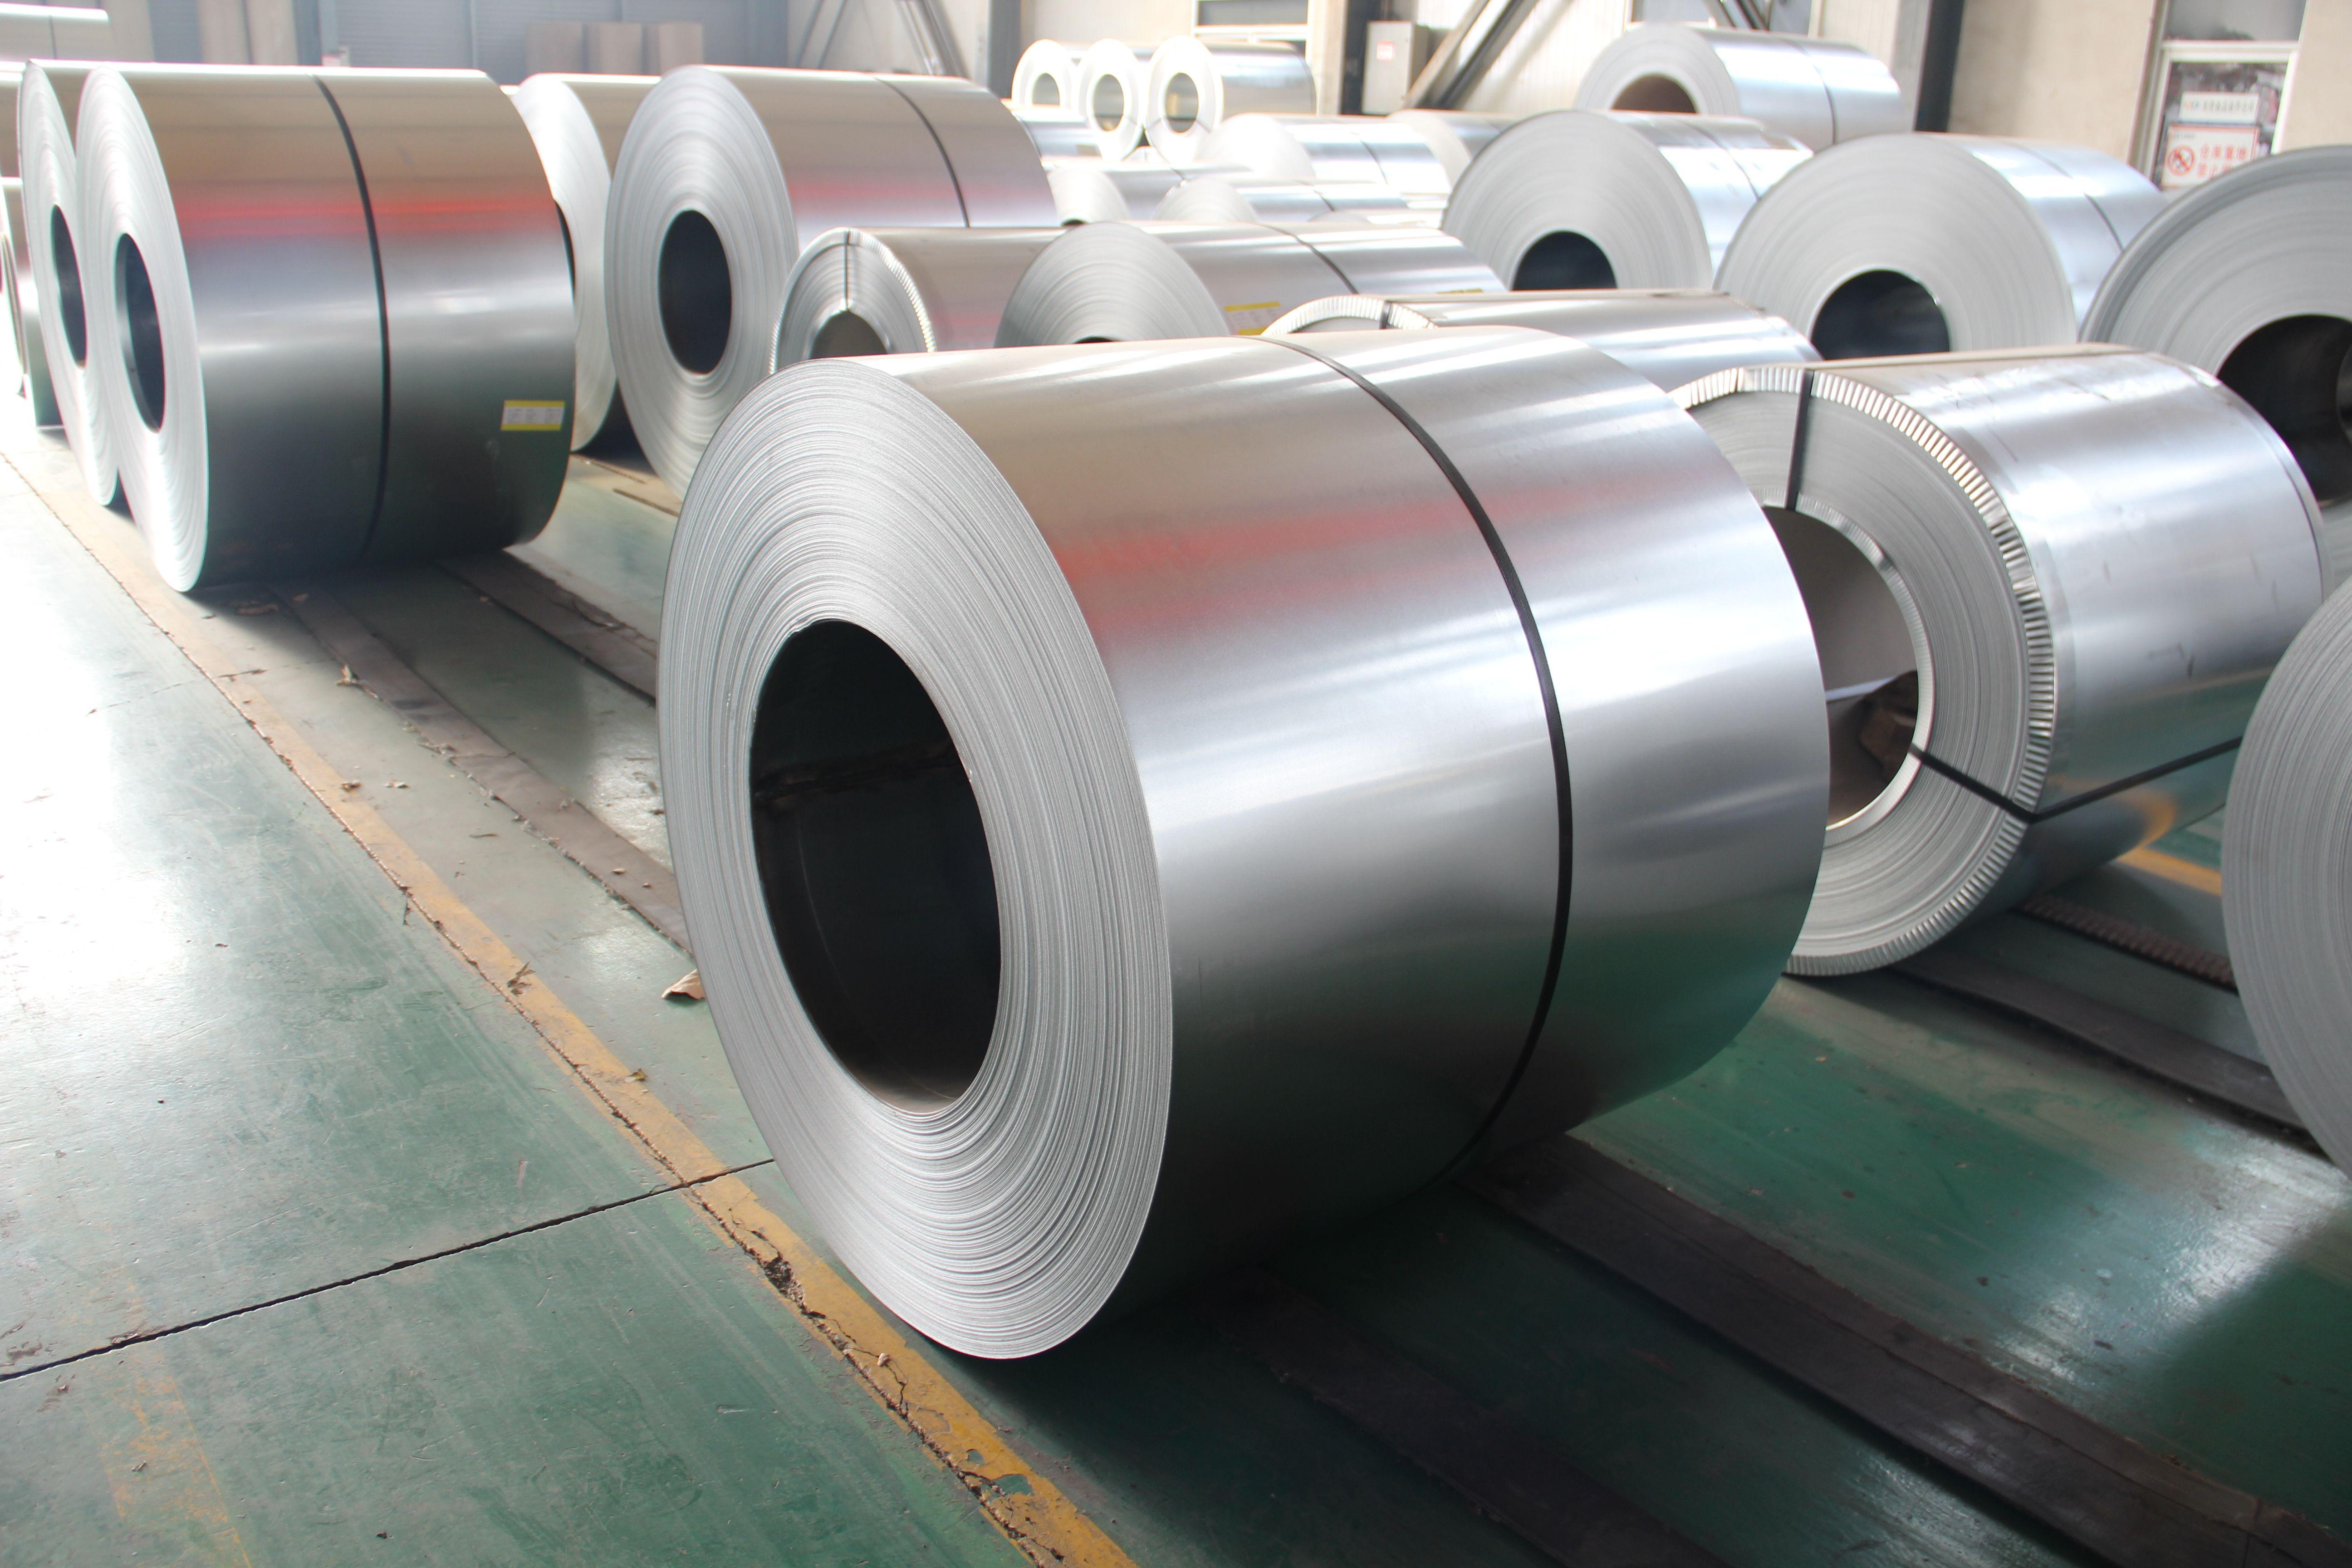 Galvanized Steel Coil Gi Thickness 0 12 4 0mm Width 30 1250mm Zinc Coating 40 275g M2 Web Www Sino Steel Net Tel 86 Zinc Coating Galvanized Steel Galvanized